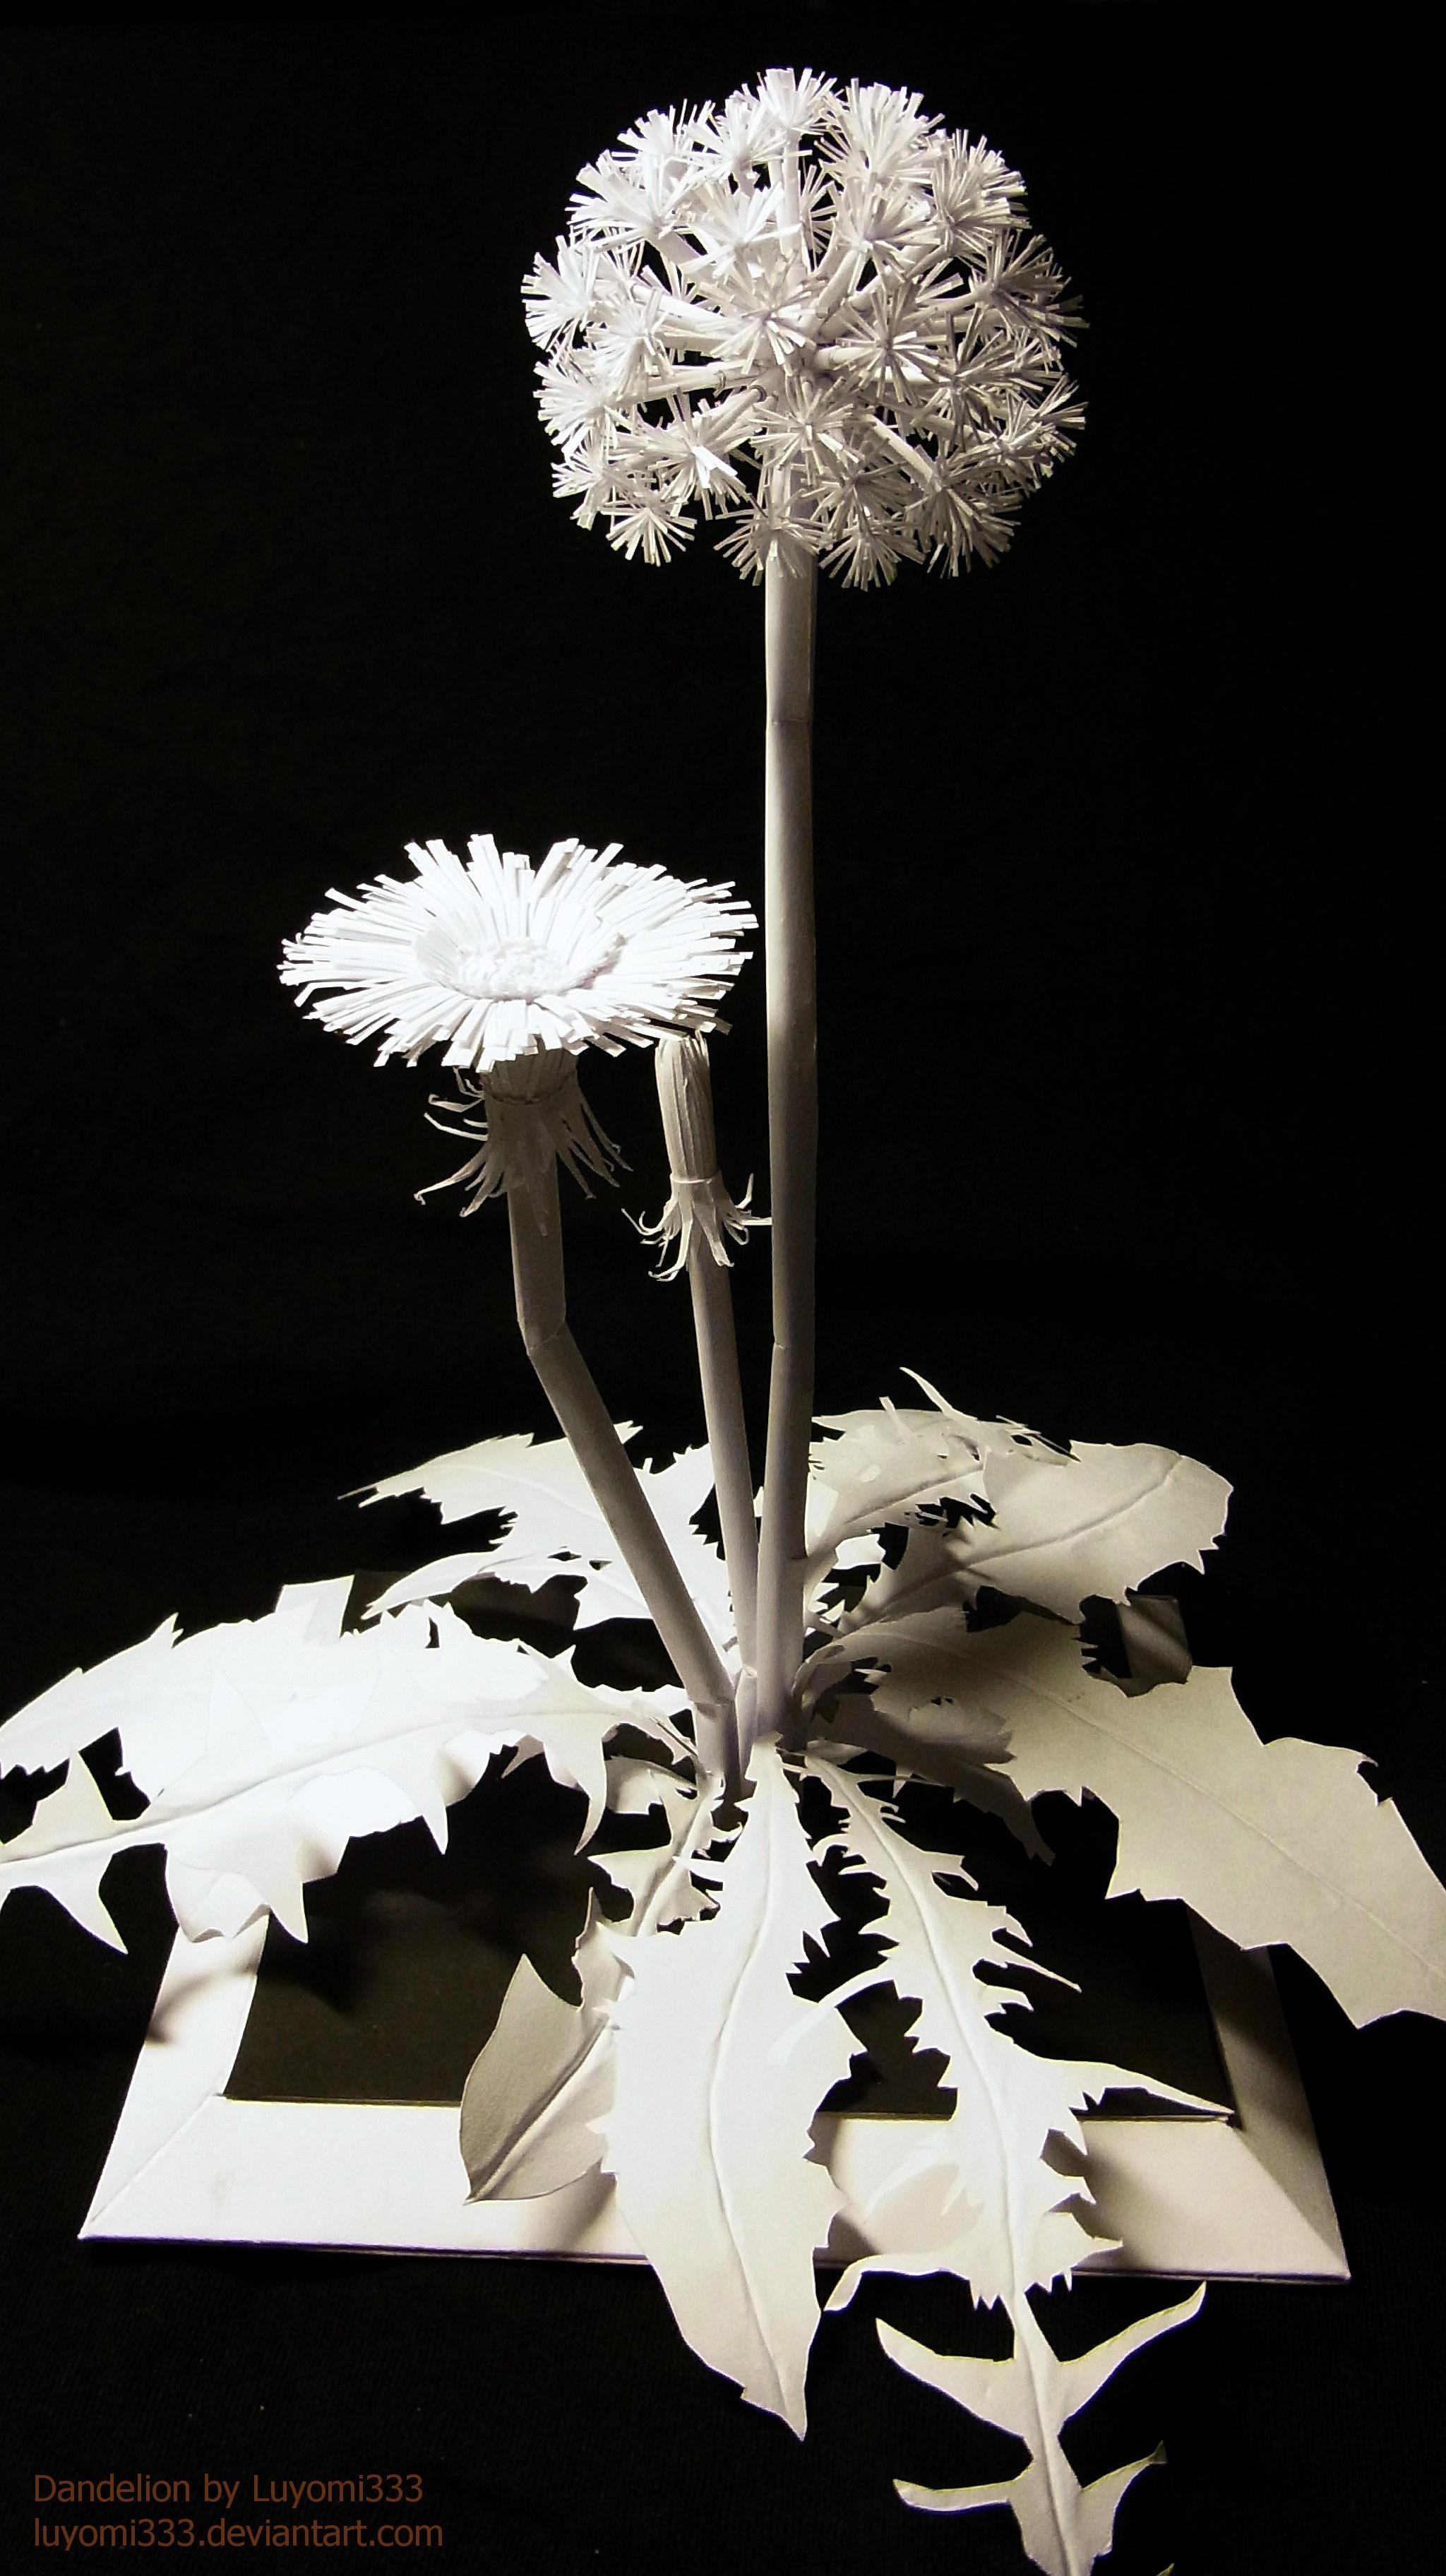 Snow Dandelion by Luyomi333